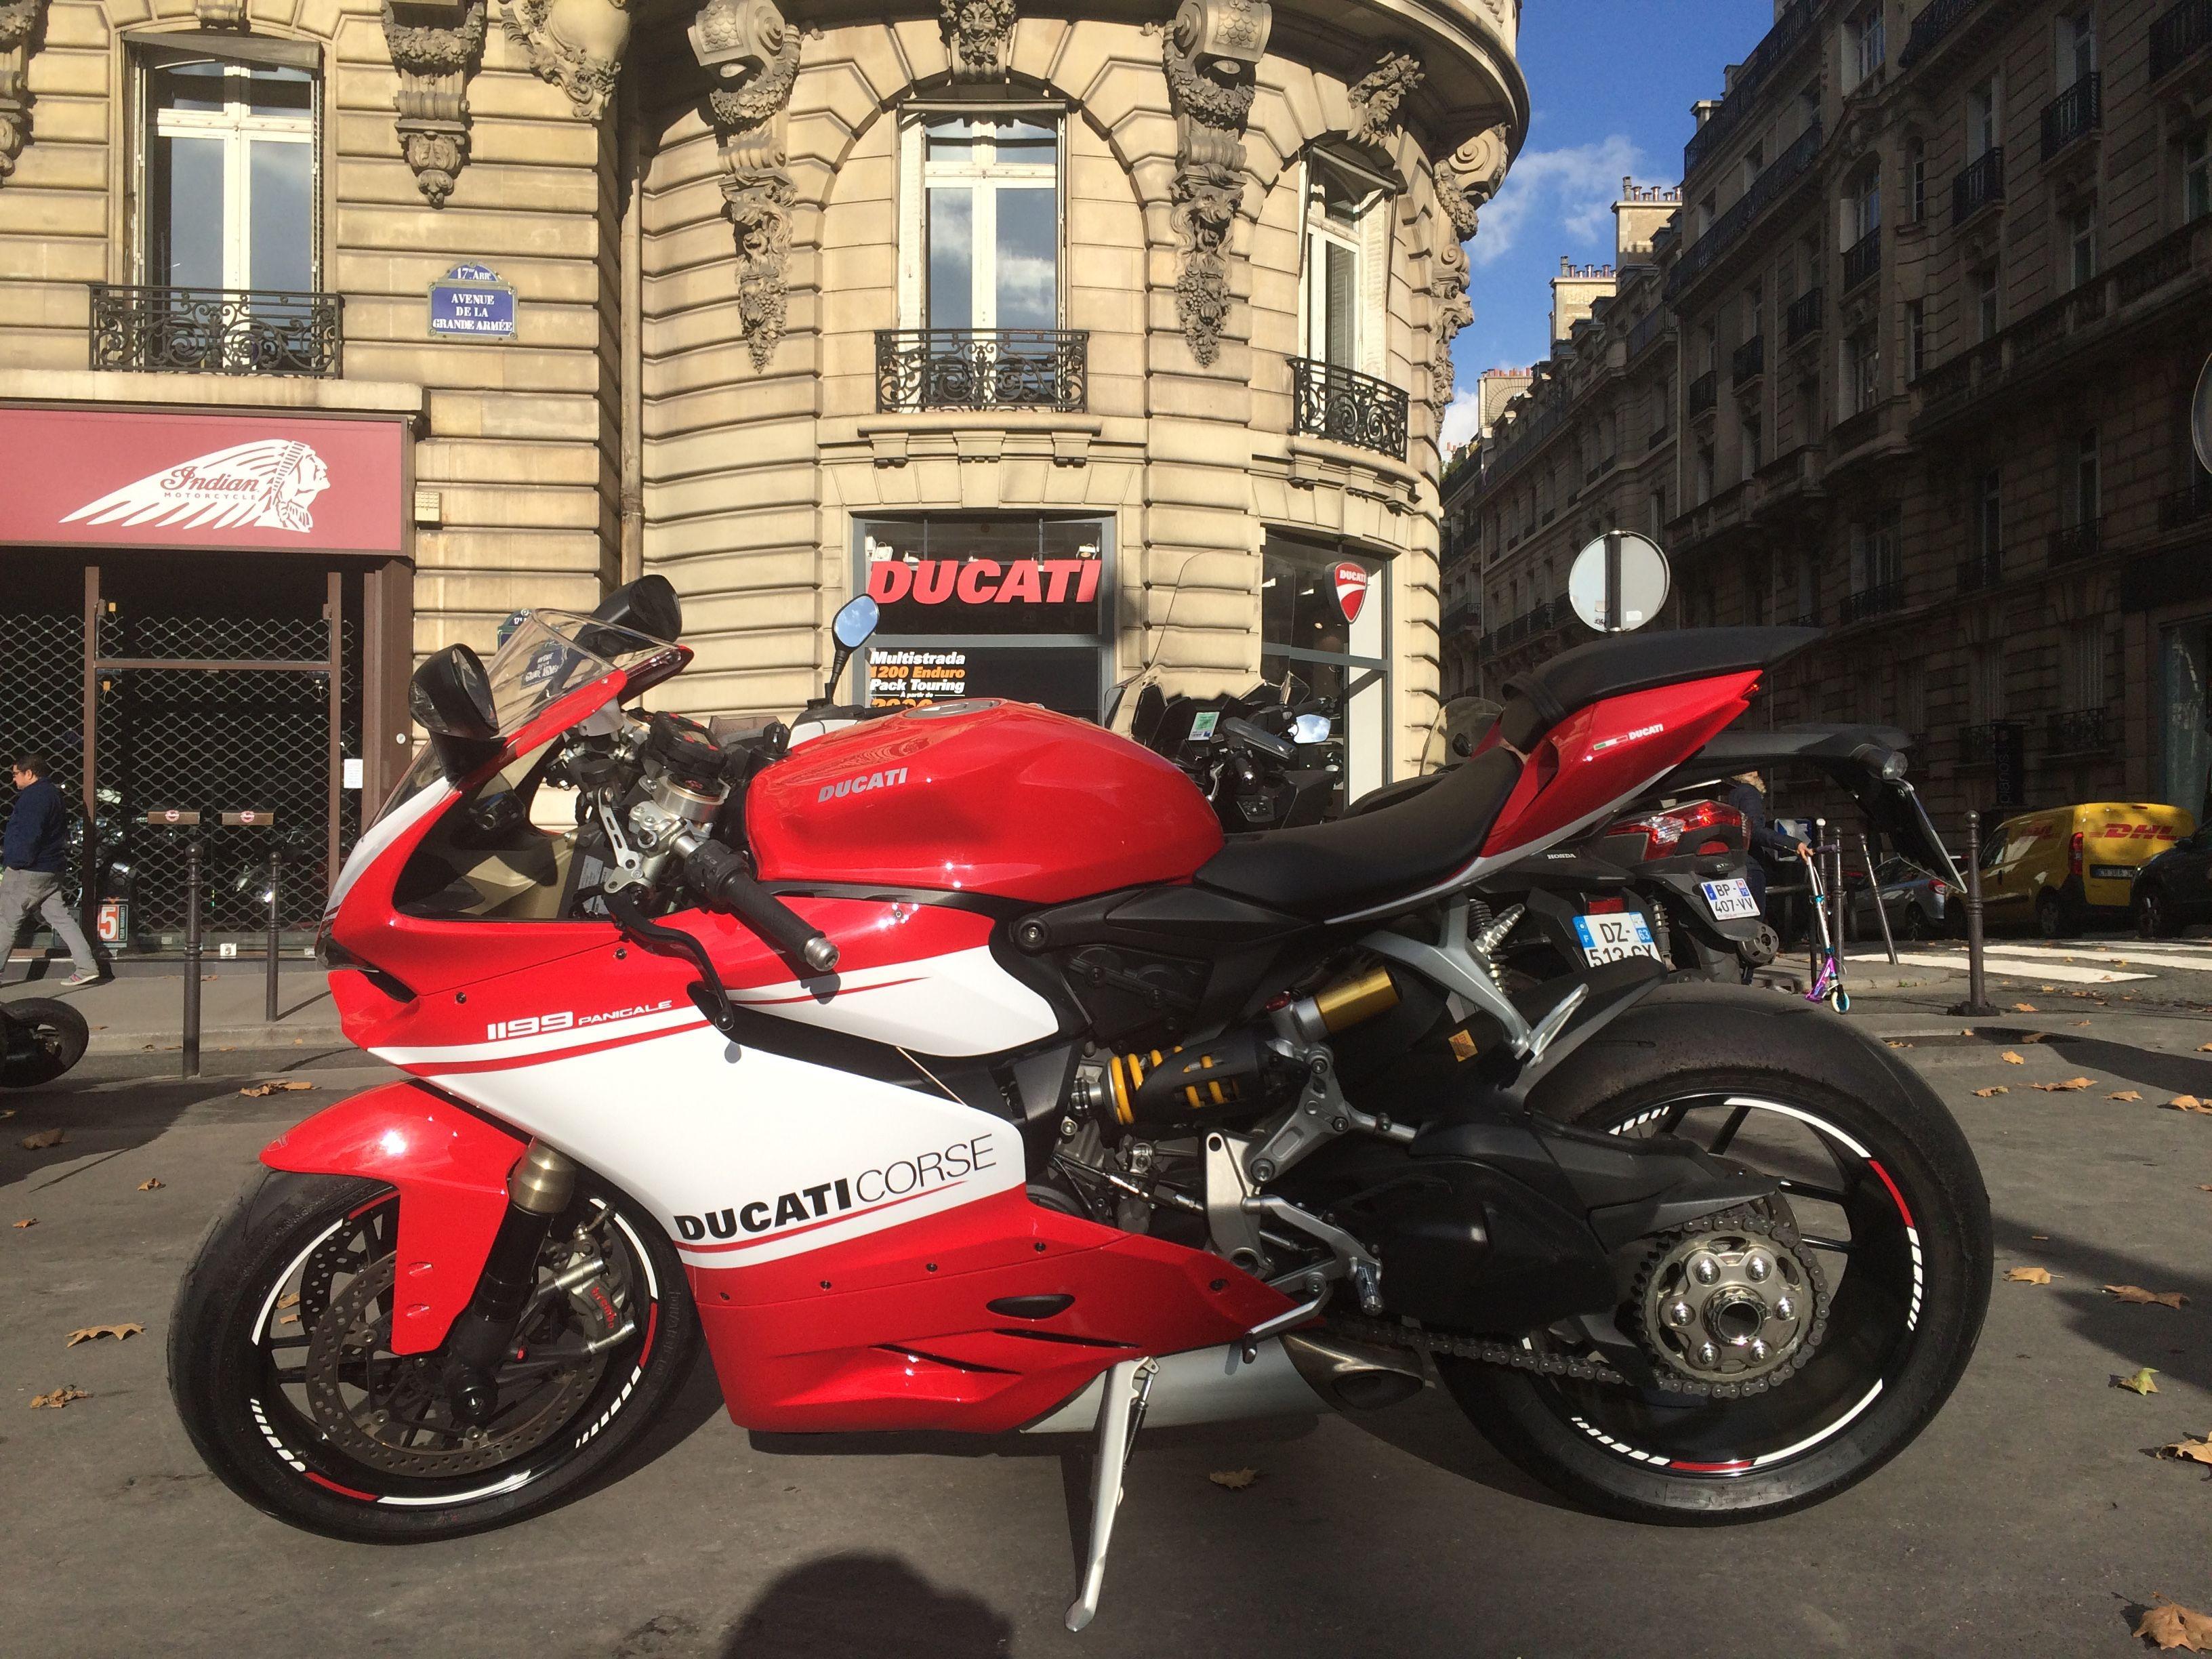 Pin by Vol.Yıldırım on moto Ducati, Motorcycle, Vehicles